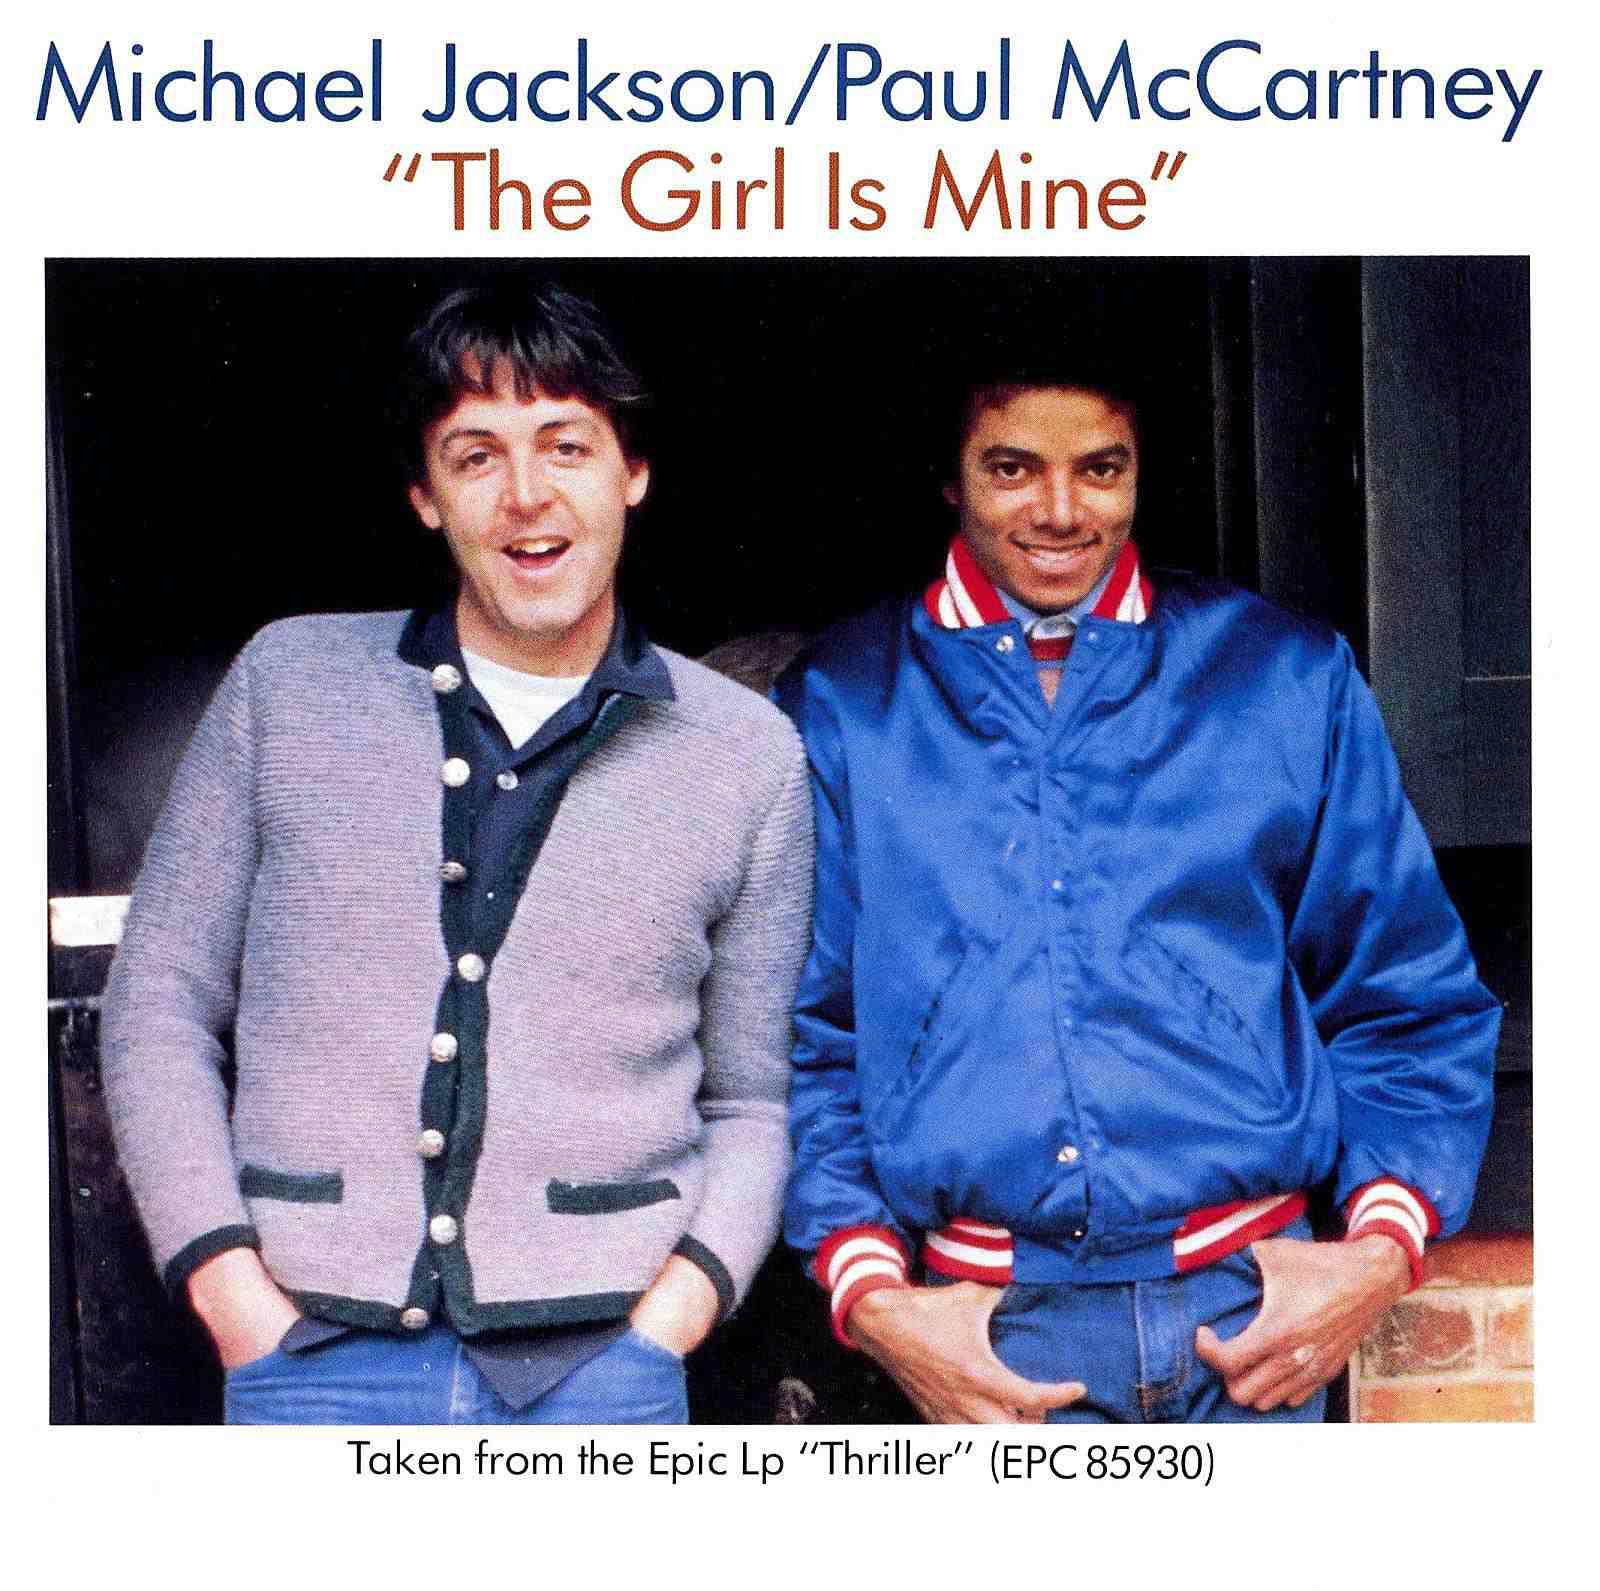 Michael Jackson and Paul McCartney - The Girl Is Mine